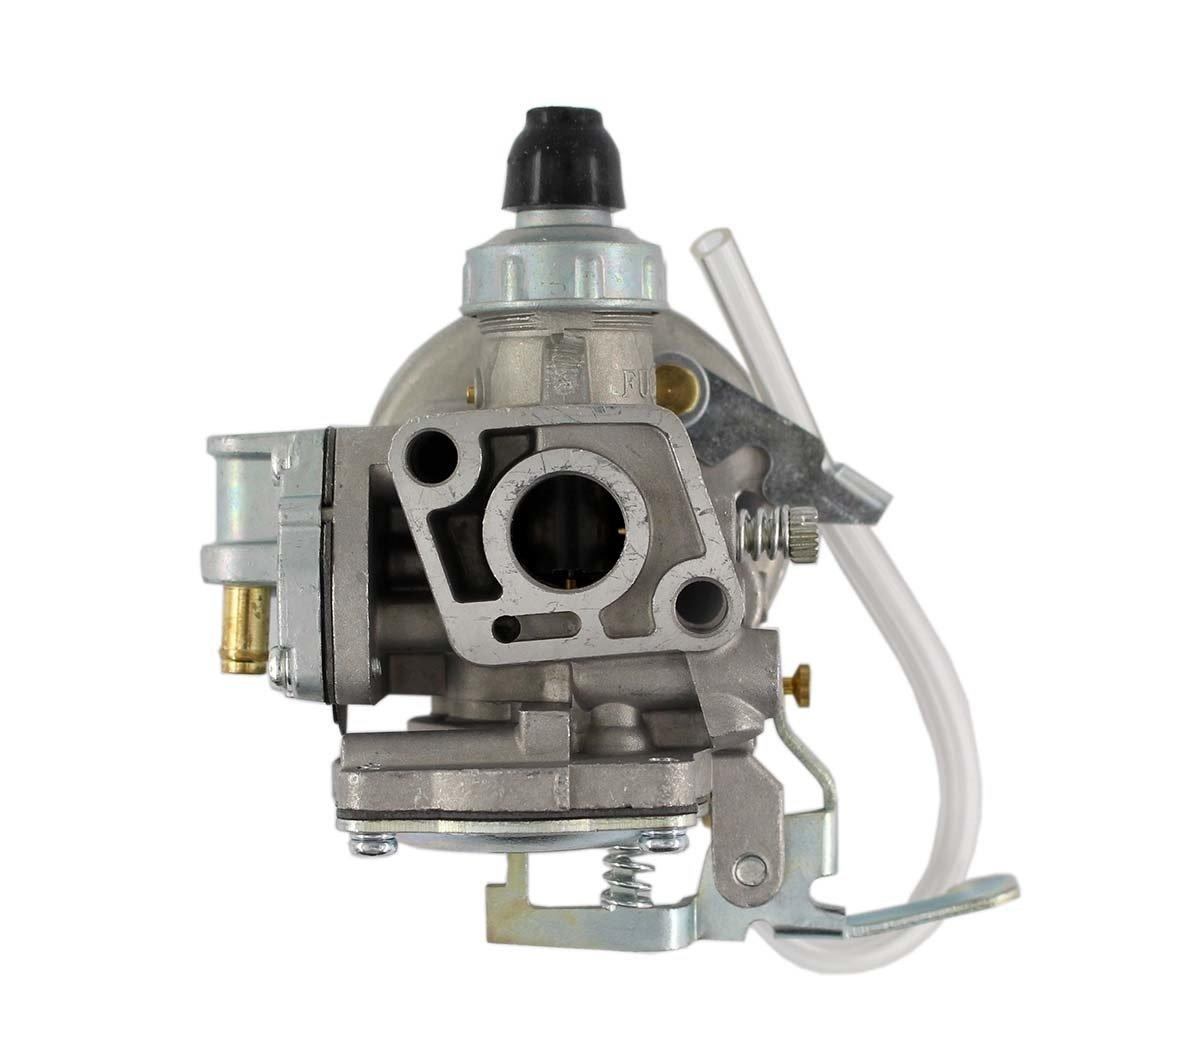 Amazon.com: Carburador para Echo Shindaiwa B45 b45la b45intl ...